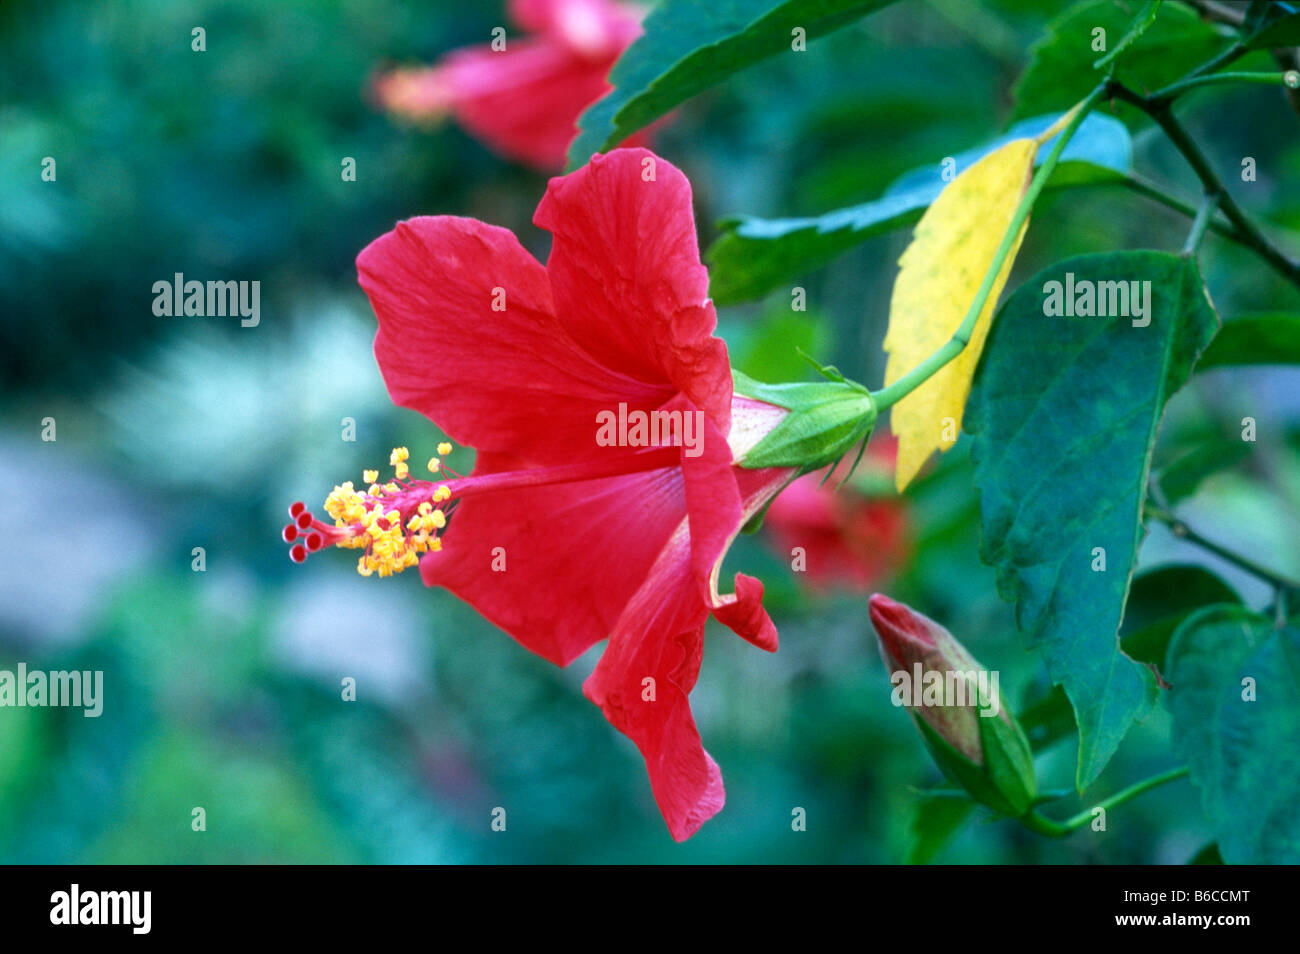 Hibiscus Stock Photos Hibiscus Stock Images Alamy